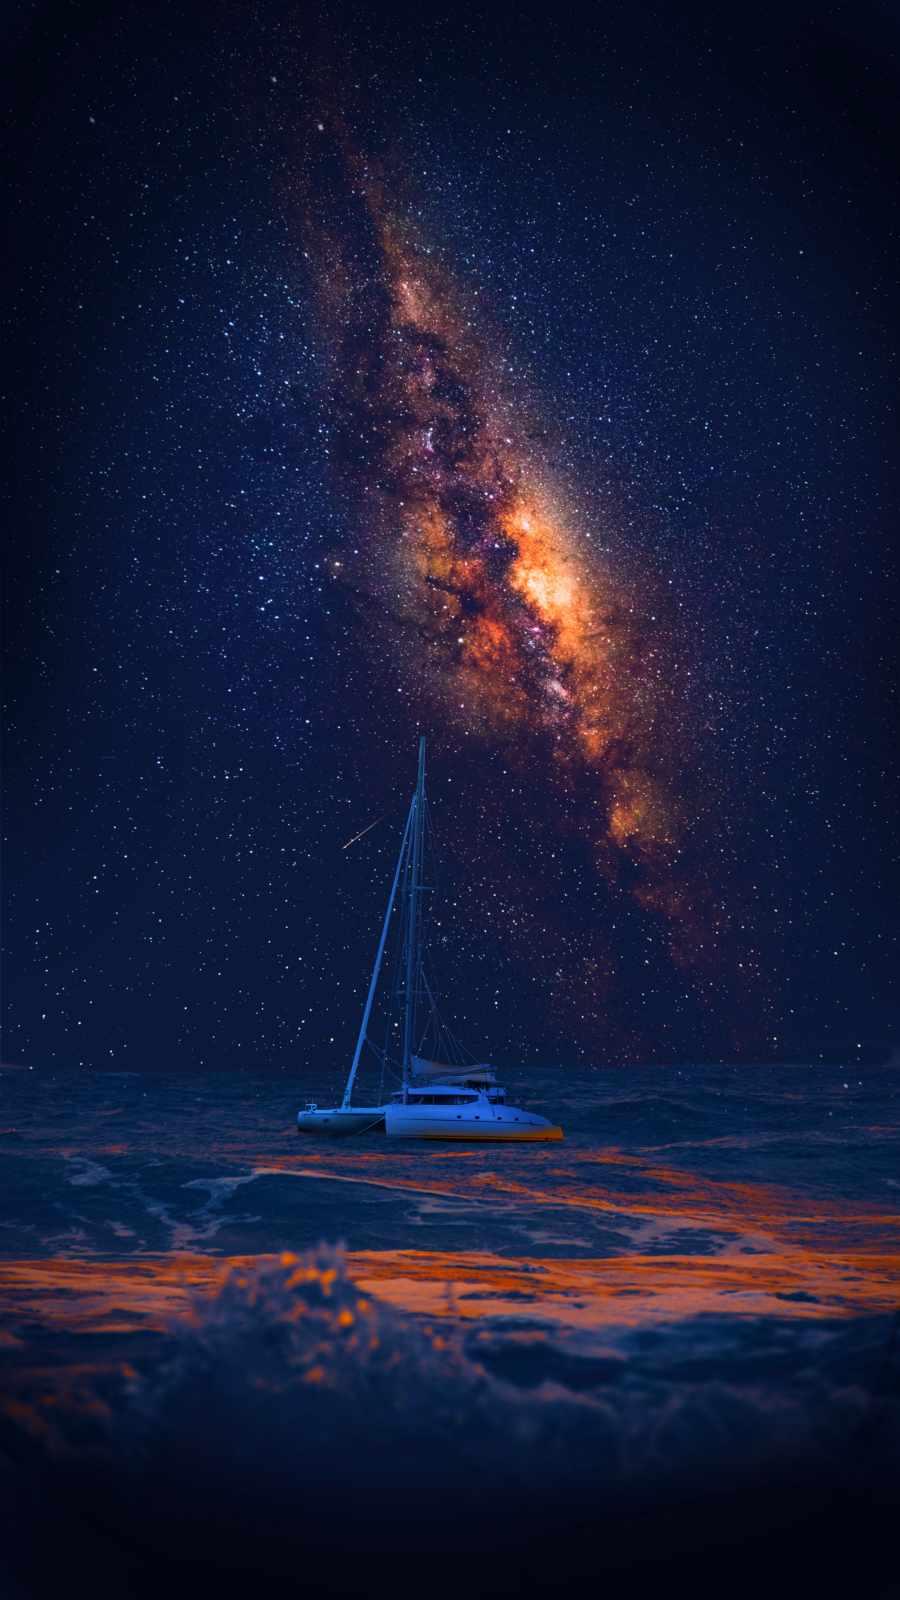 Space Ocean Yacht iPhone Wallpaper